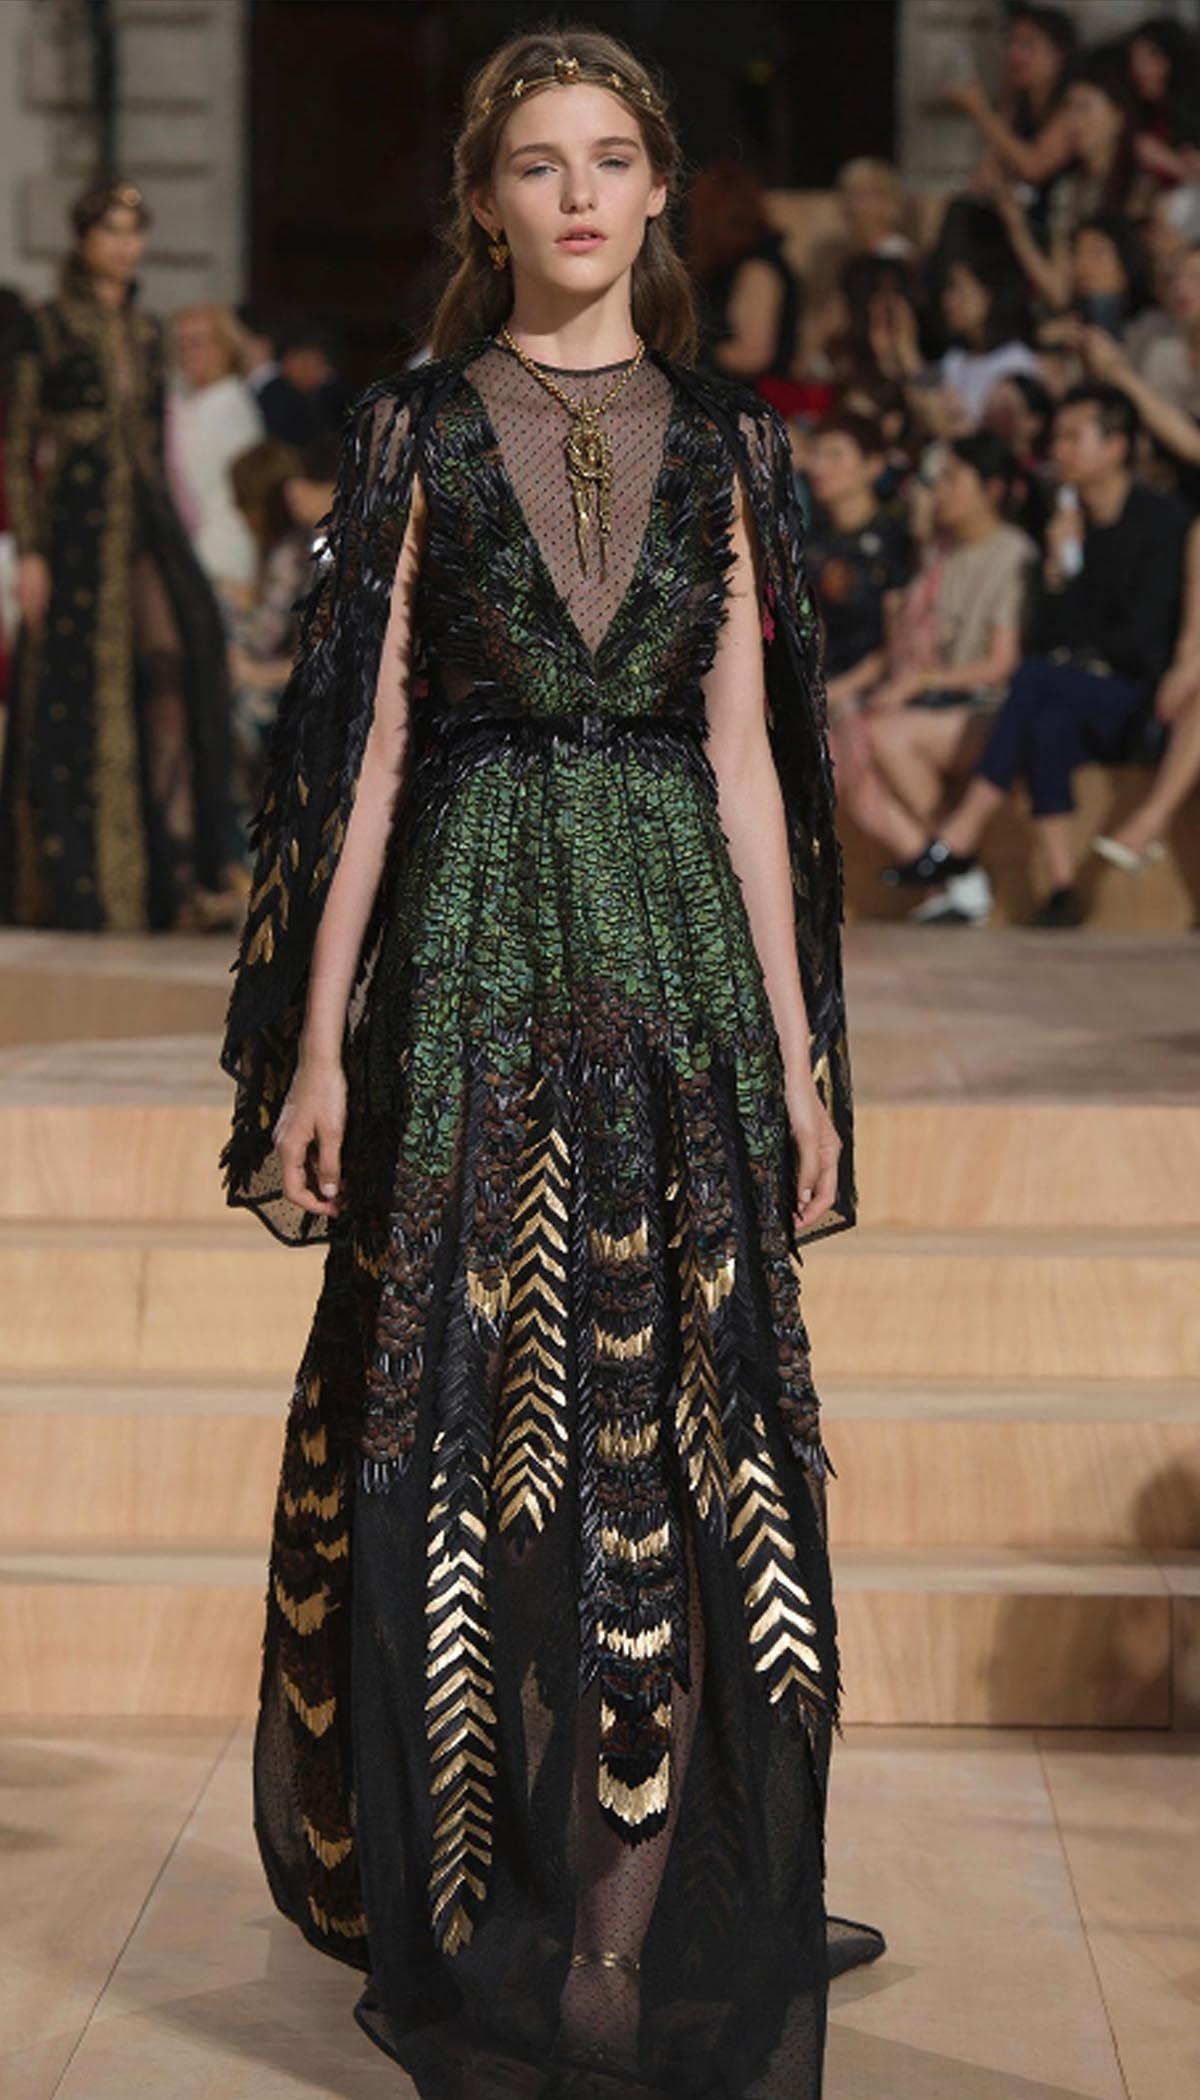 4bc47f03d662aaa Detalles pasarela Valentino couture otoño/invierno 2015-2016 ...